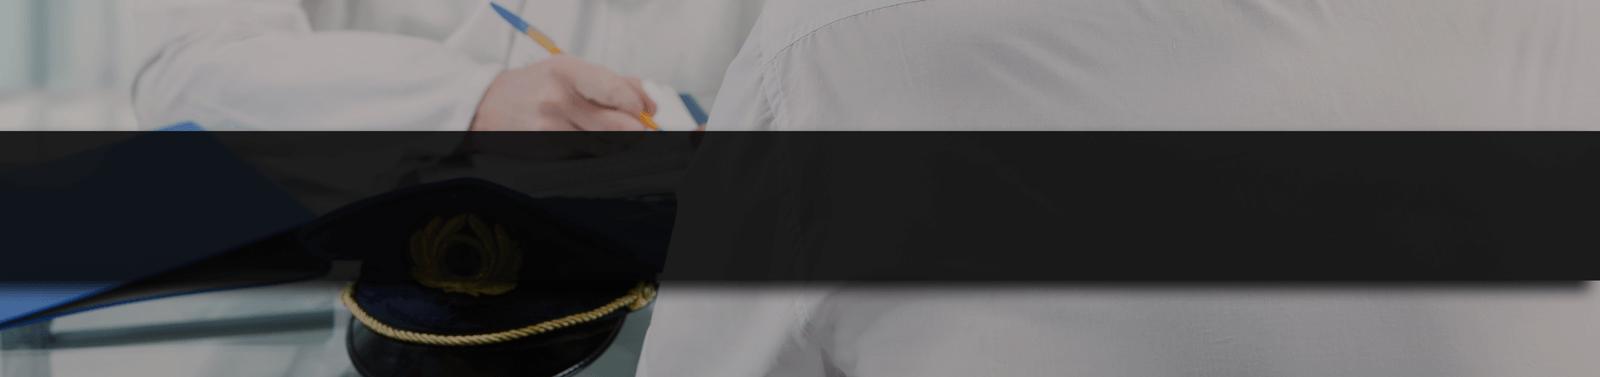 FAA-Medical-Exams-final-one | HealthMark